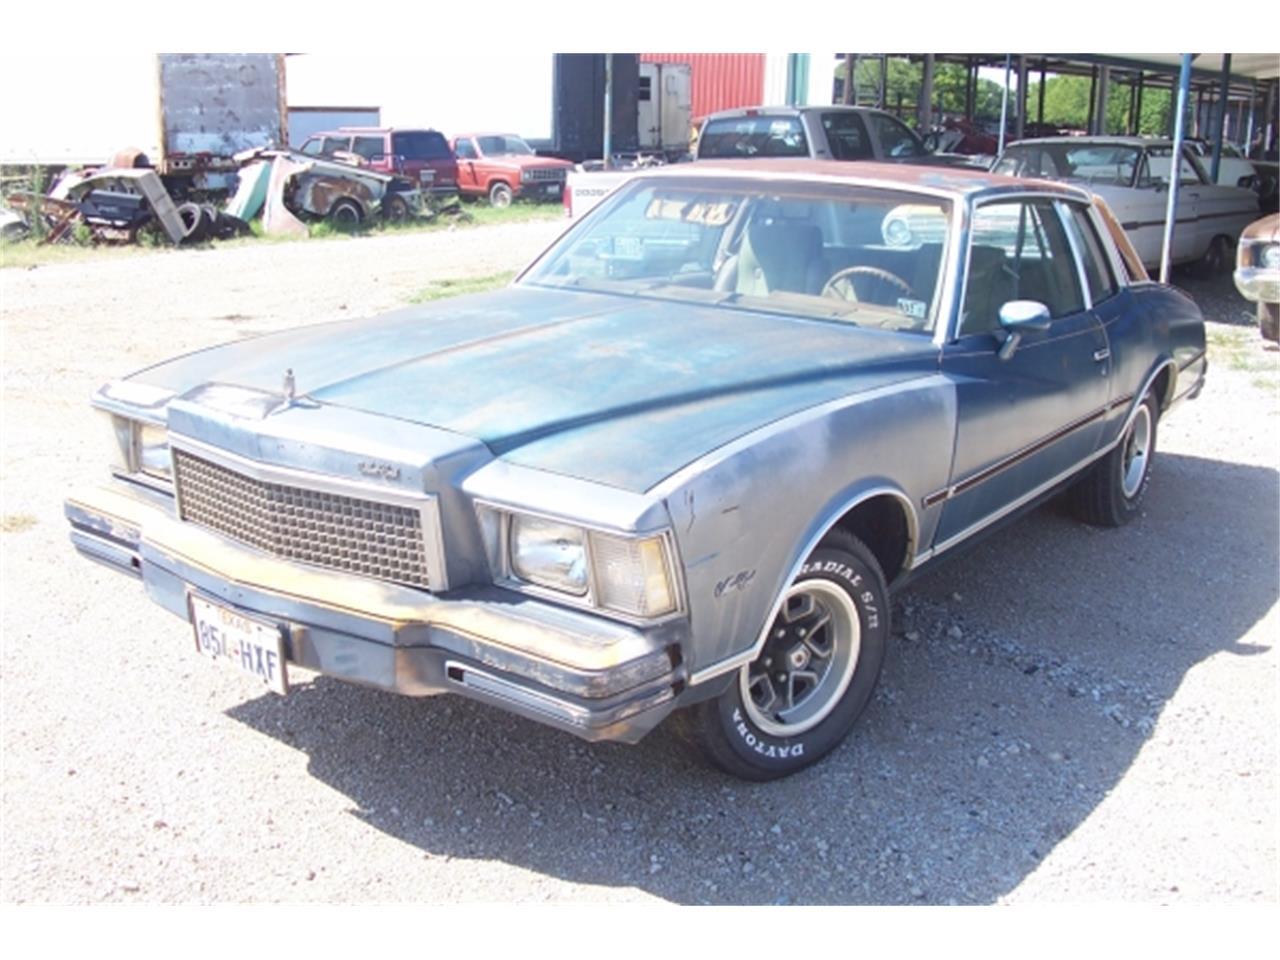 For Sale: 1978 Chevrolet Monte Carlo in Denton, Texas